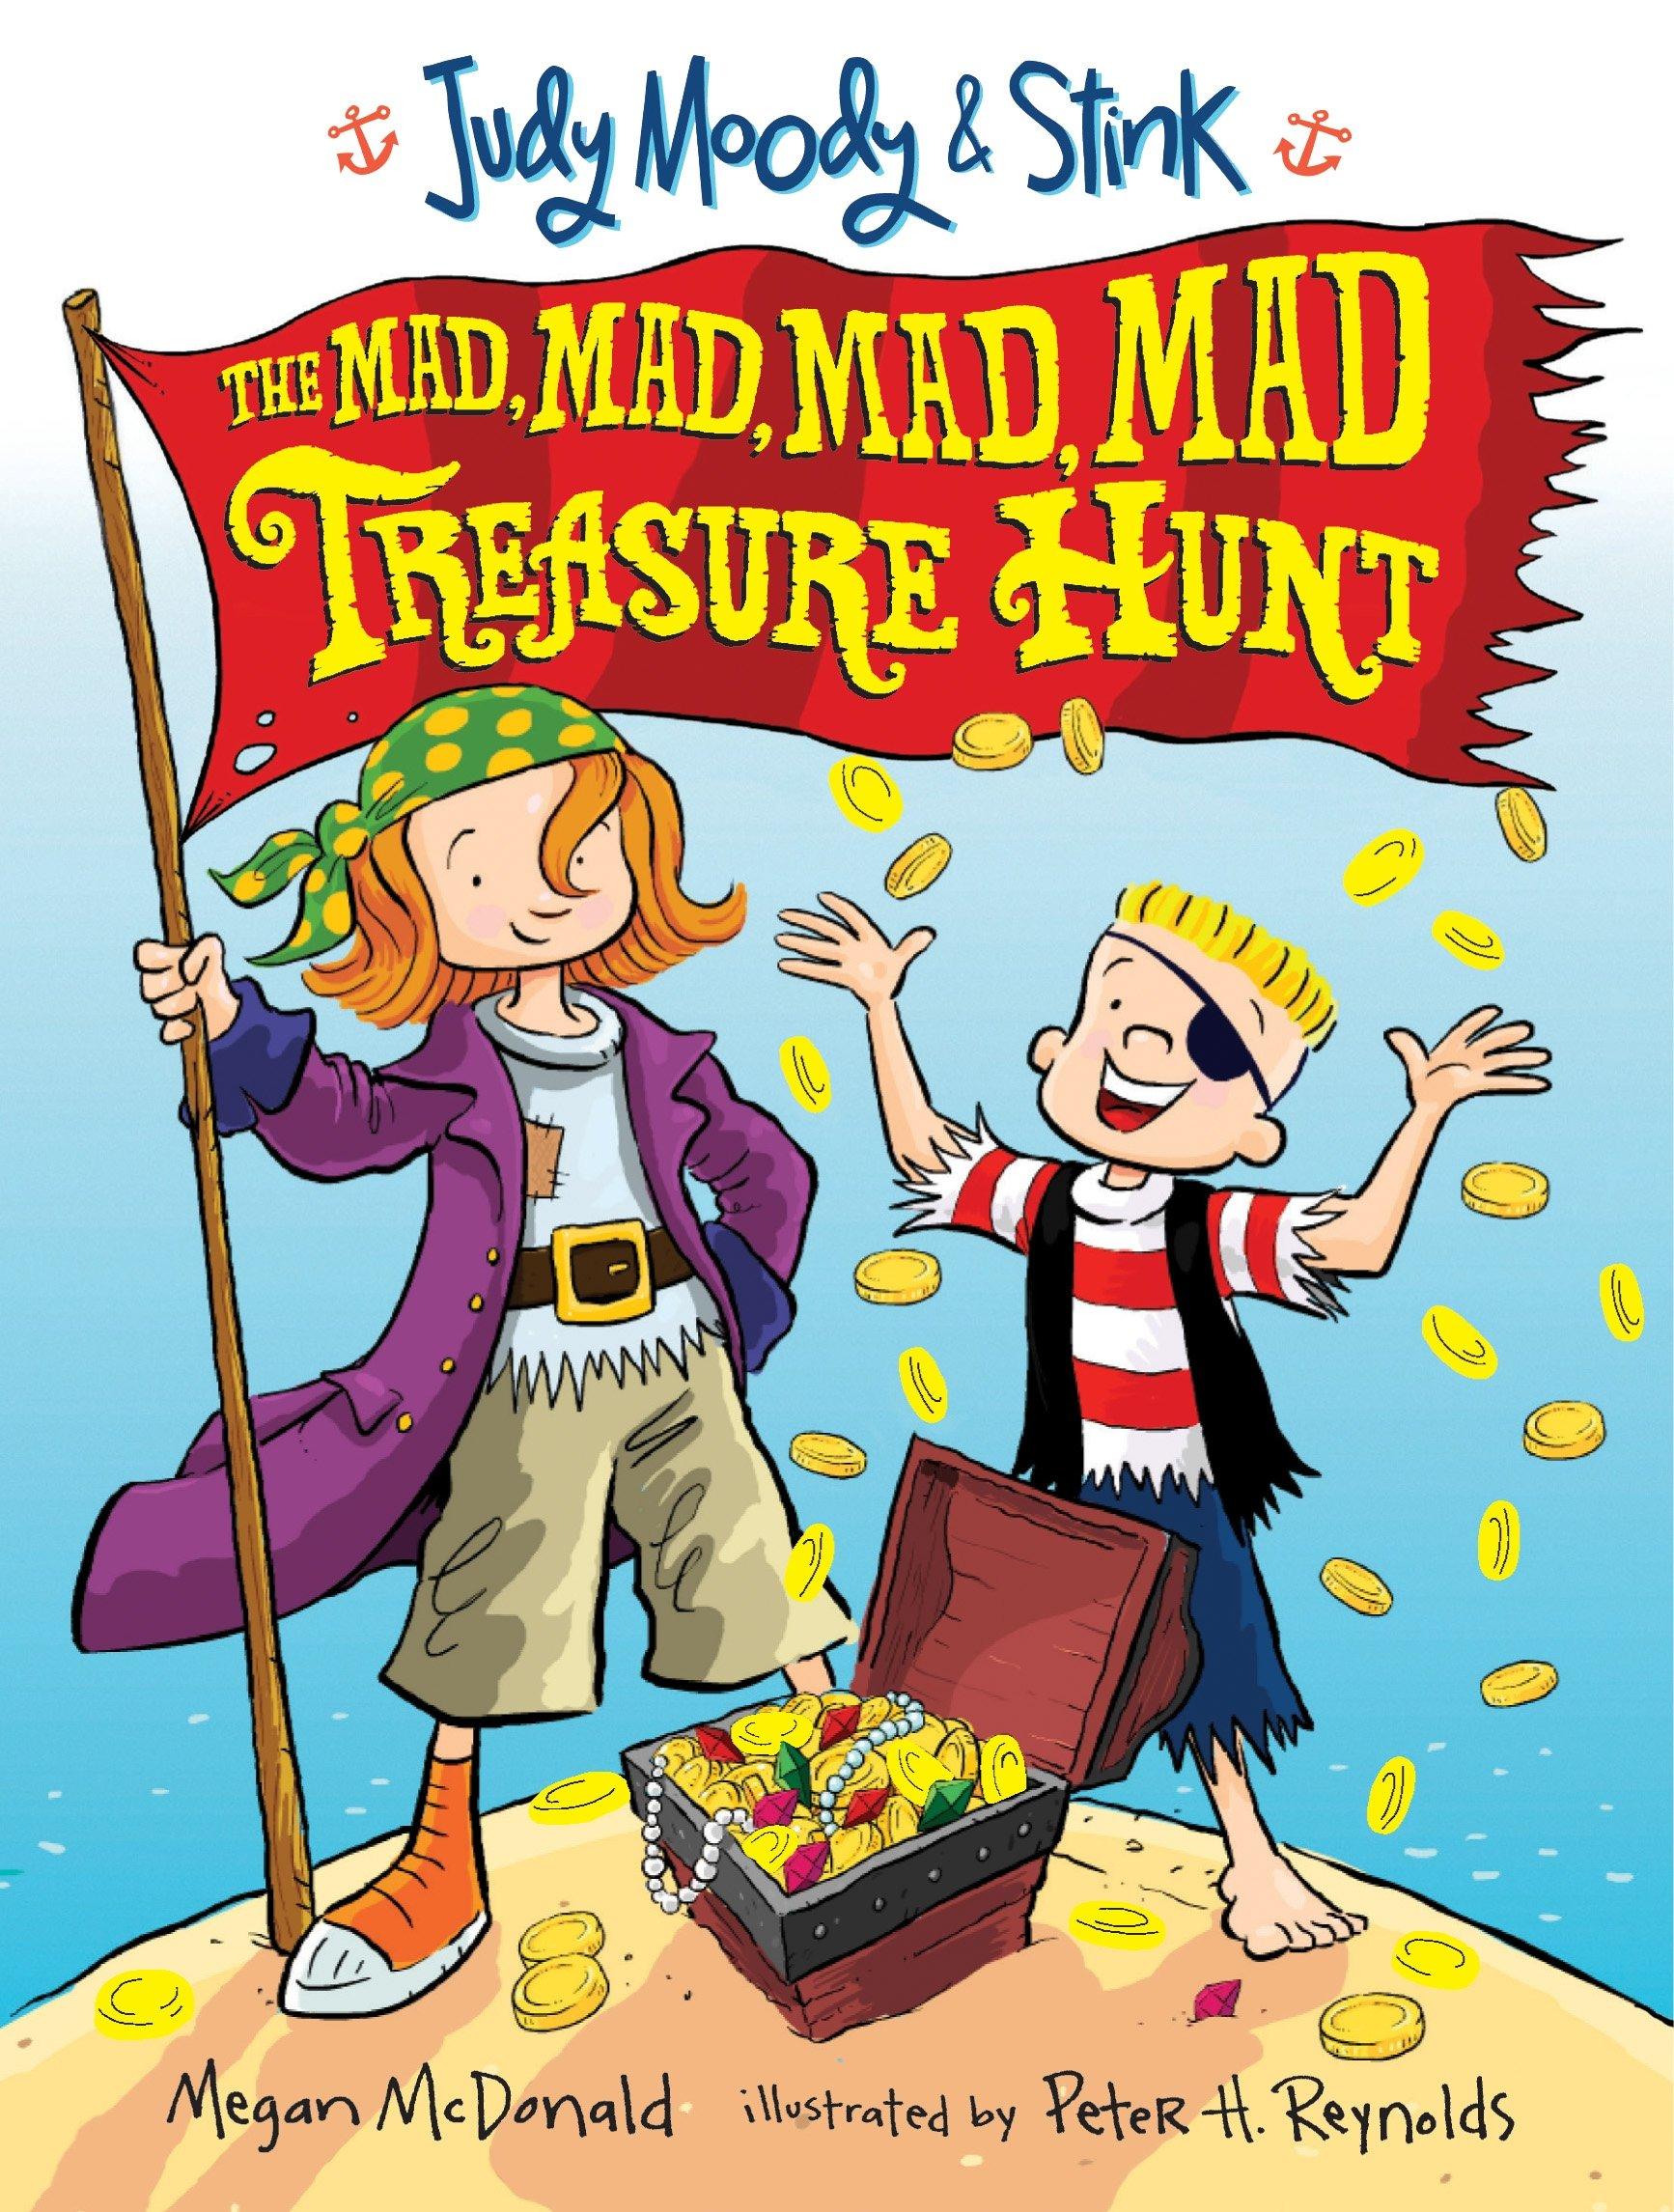 Amazon.com: Judy Moody and Stink: The Mad, Mad, Mad, Mad Treasure Hunt  (9780763643515): McDonald, Megan, Reynolds, Peter H.: Books